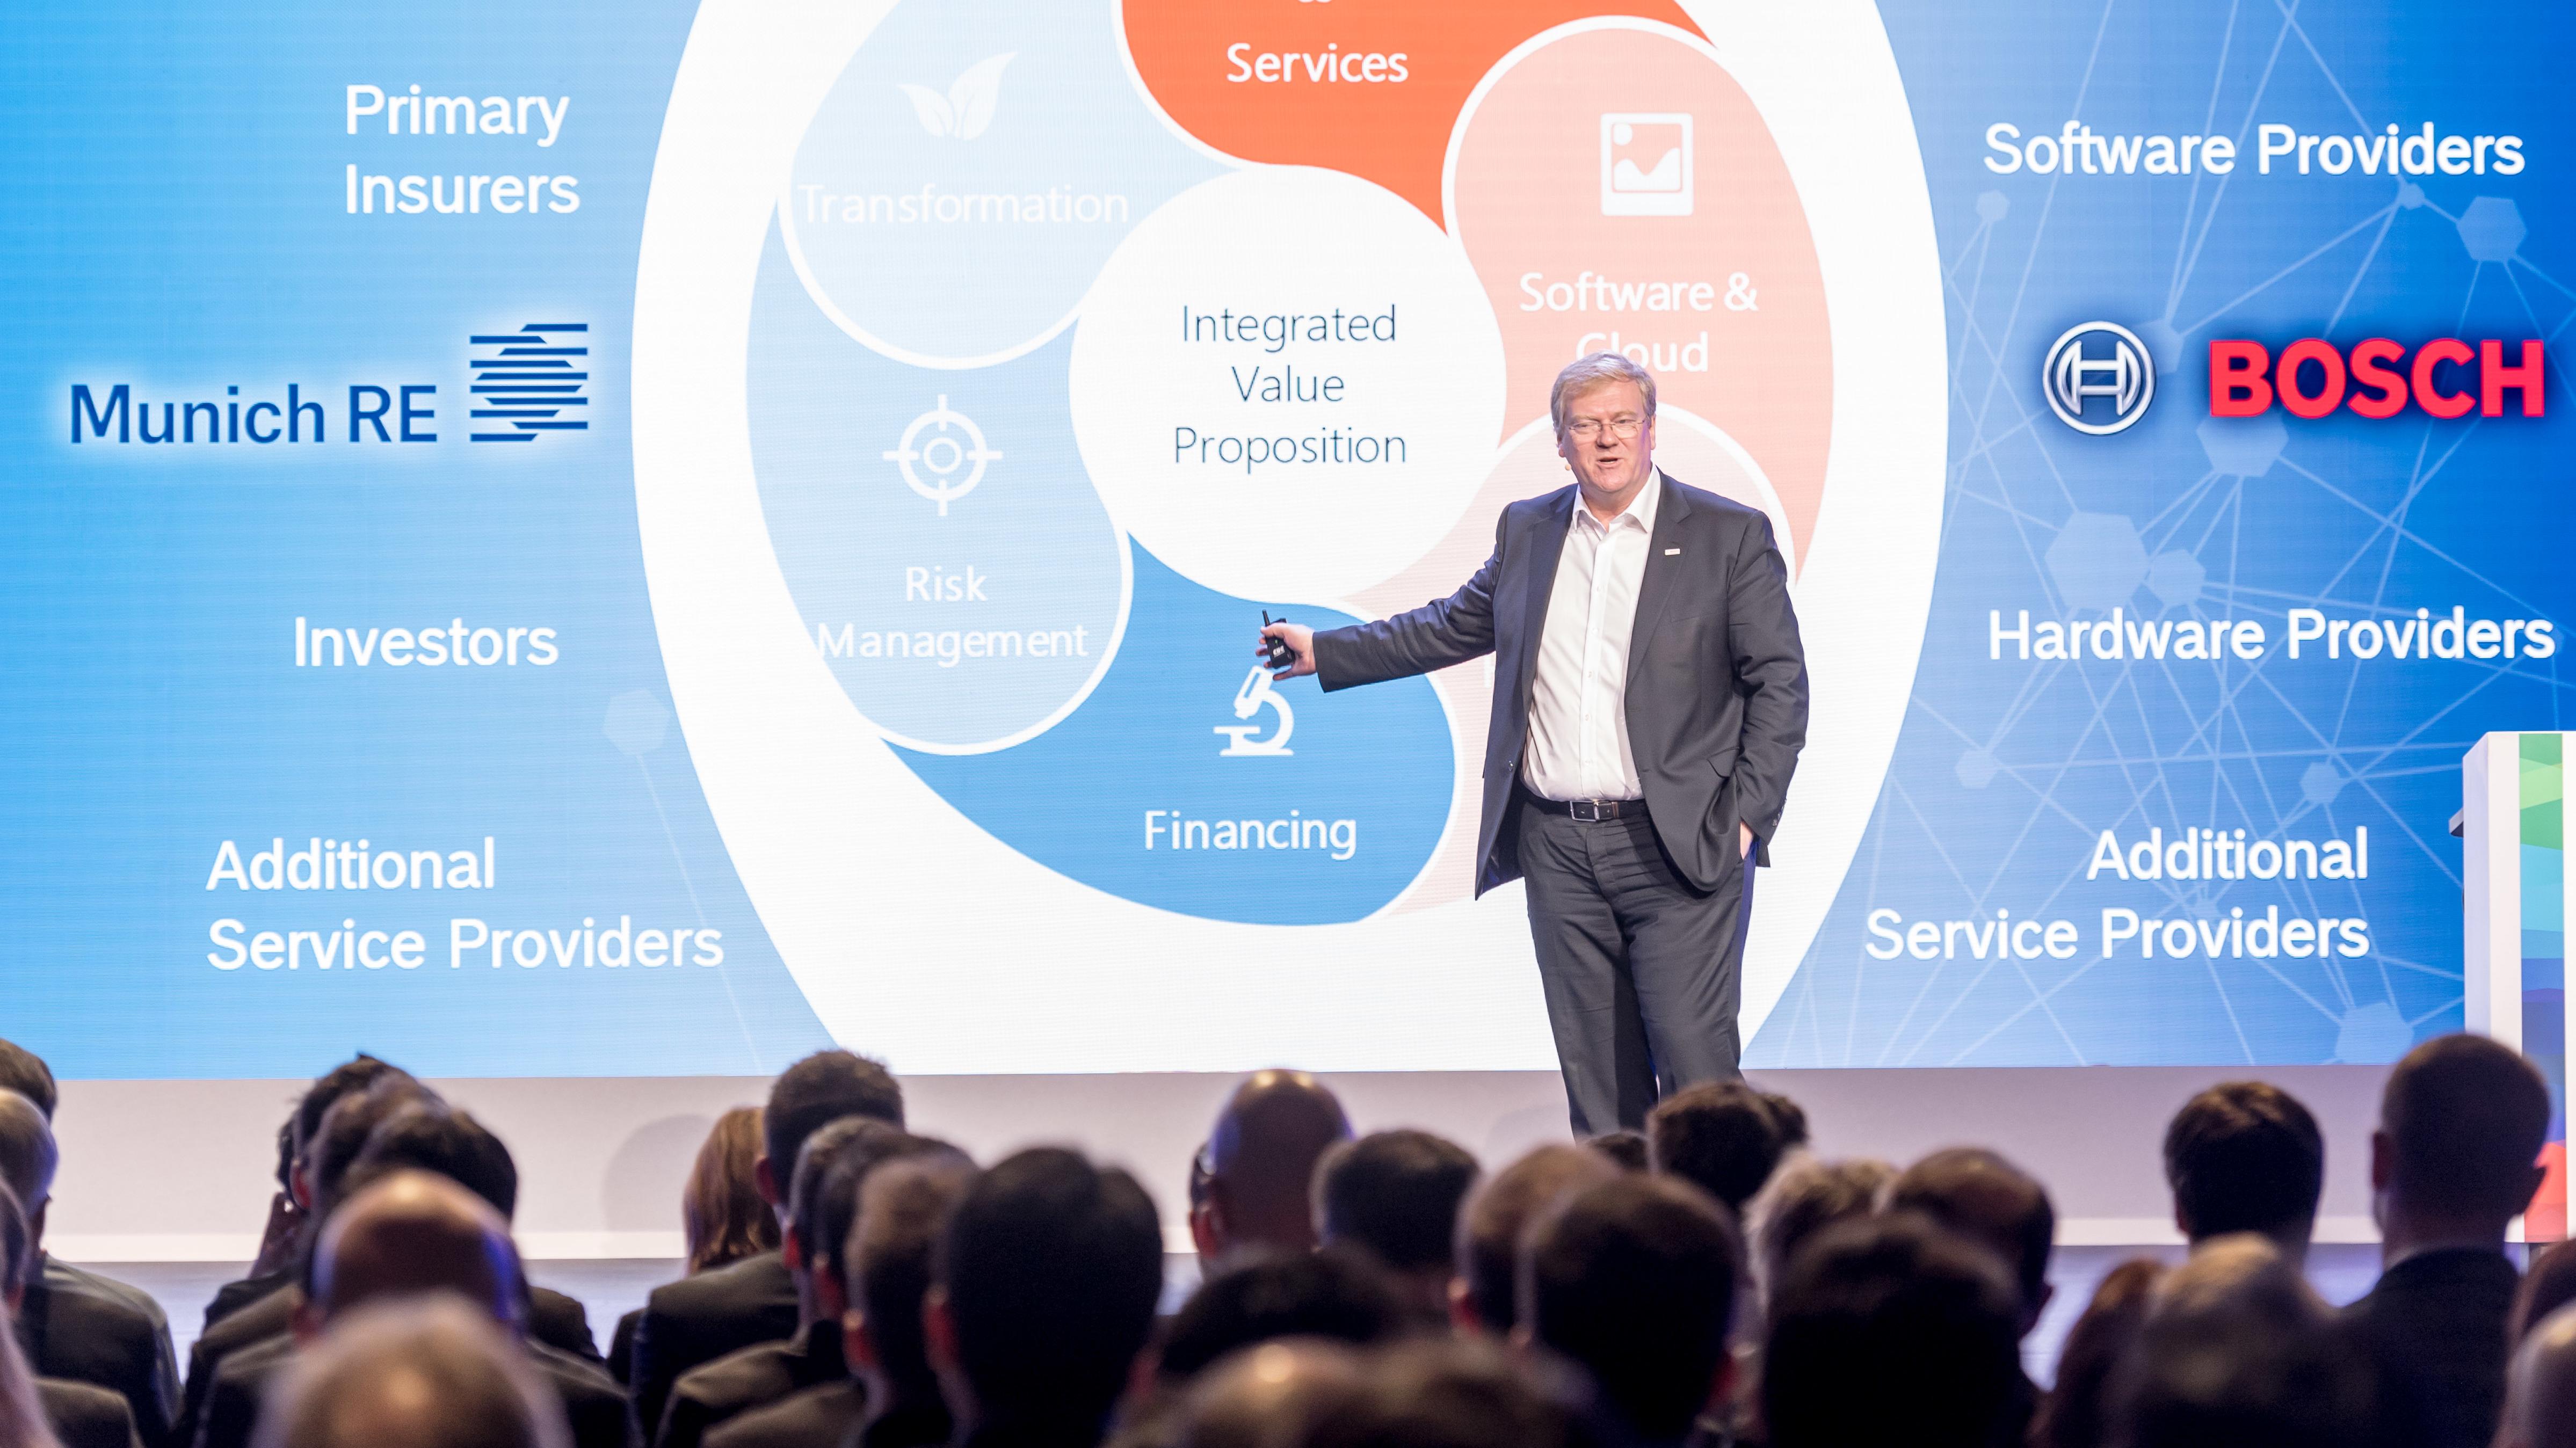 Partnership Agreed Between Bosch And Munich Re Bosch Media Service